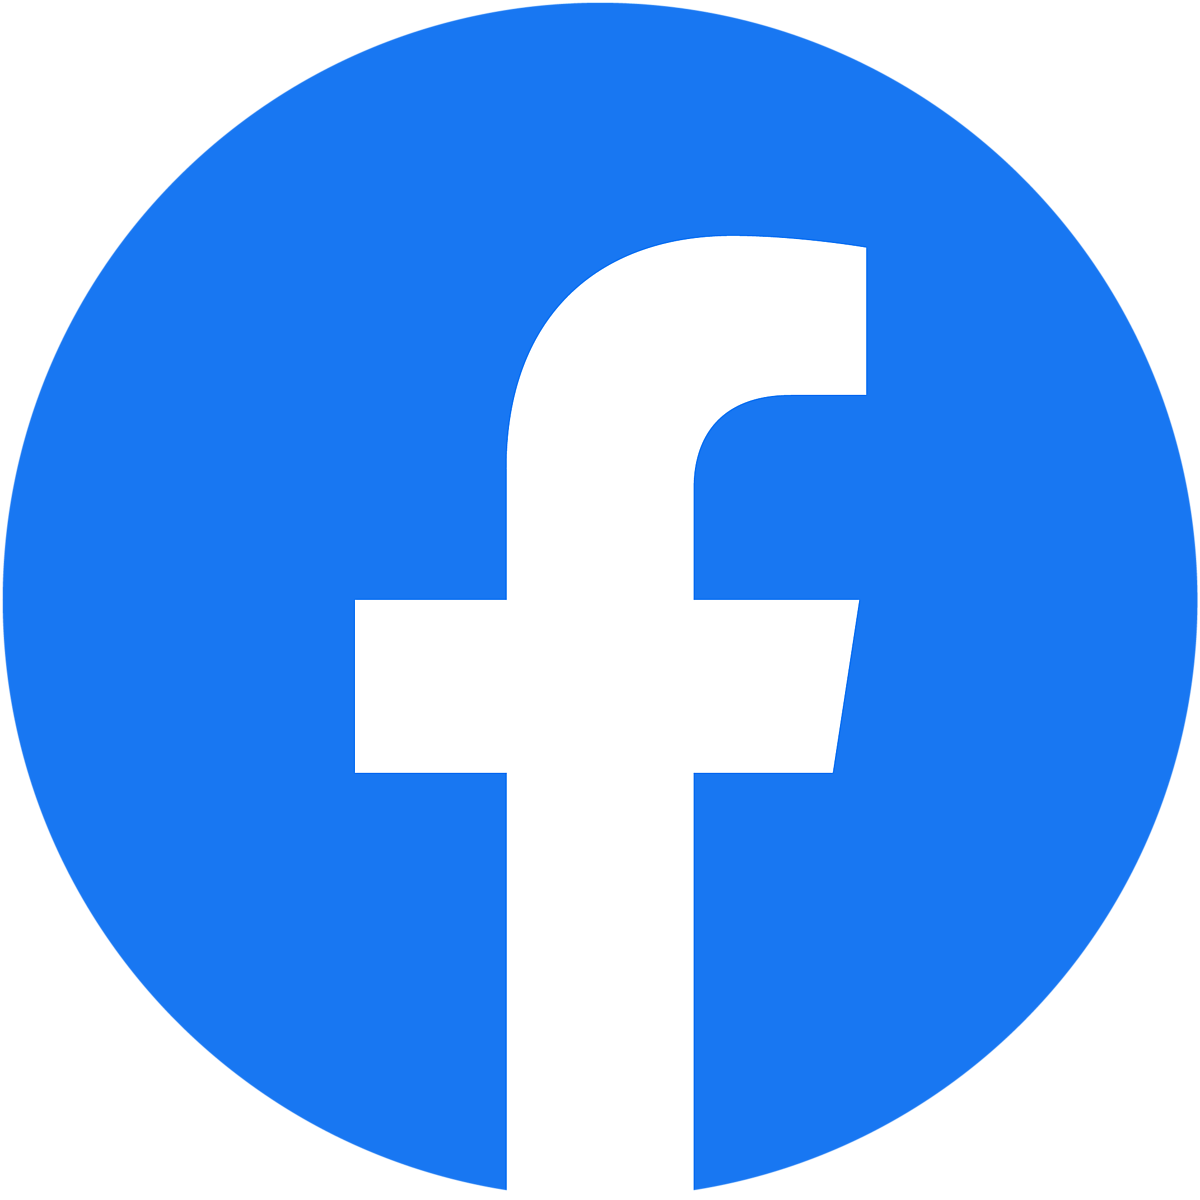 fb_logo_2019.png [41.95 KB]